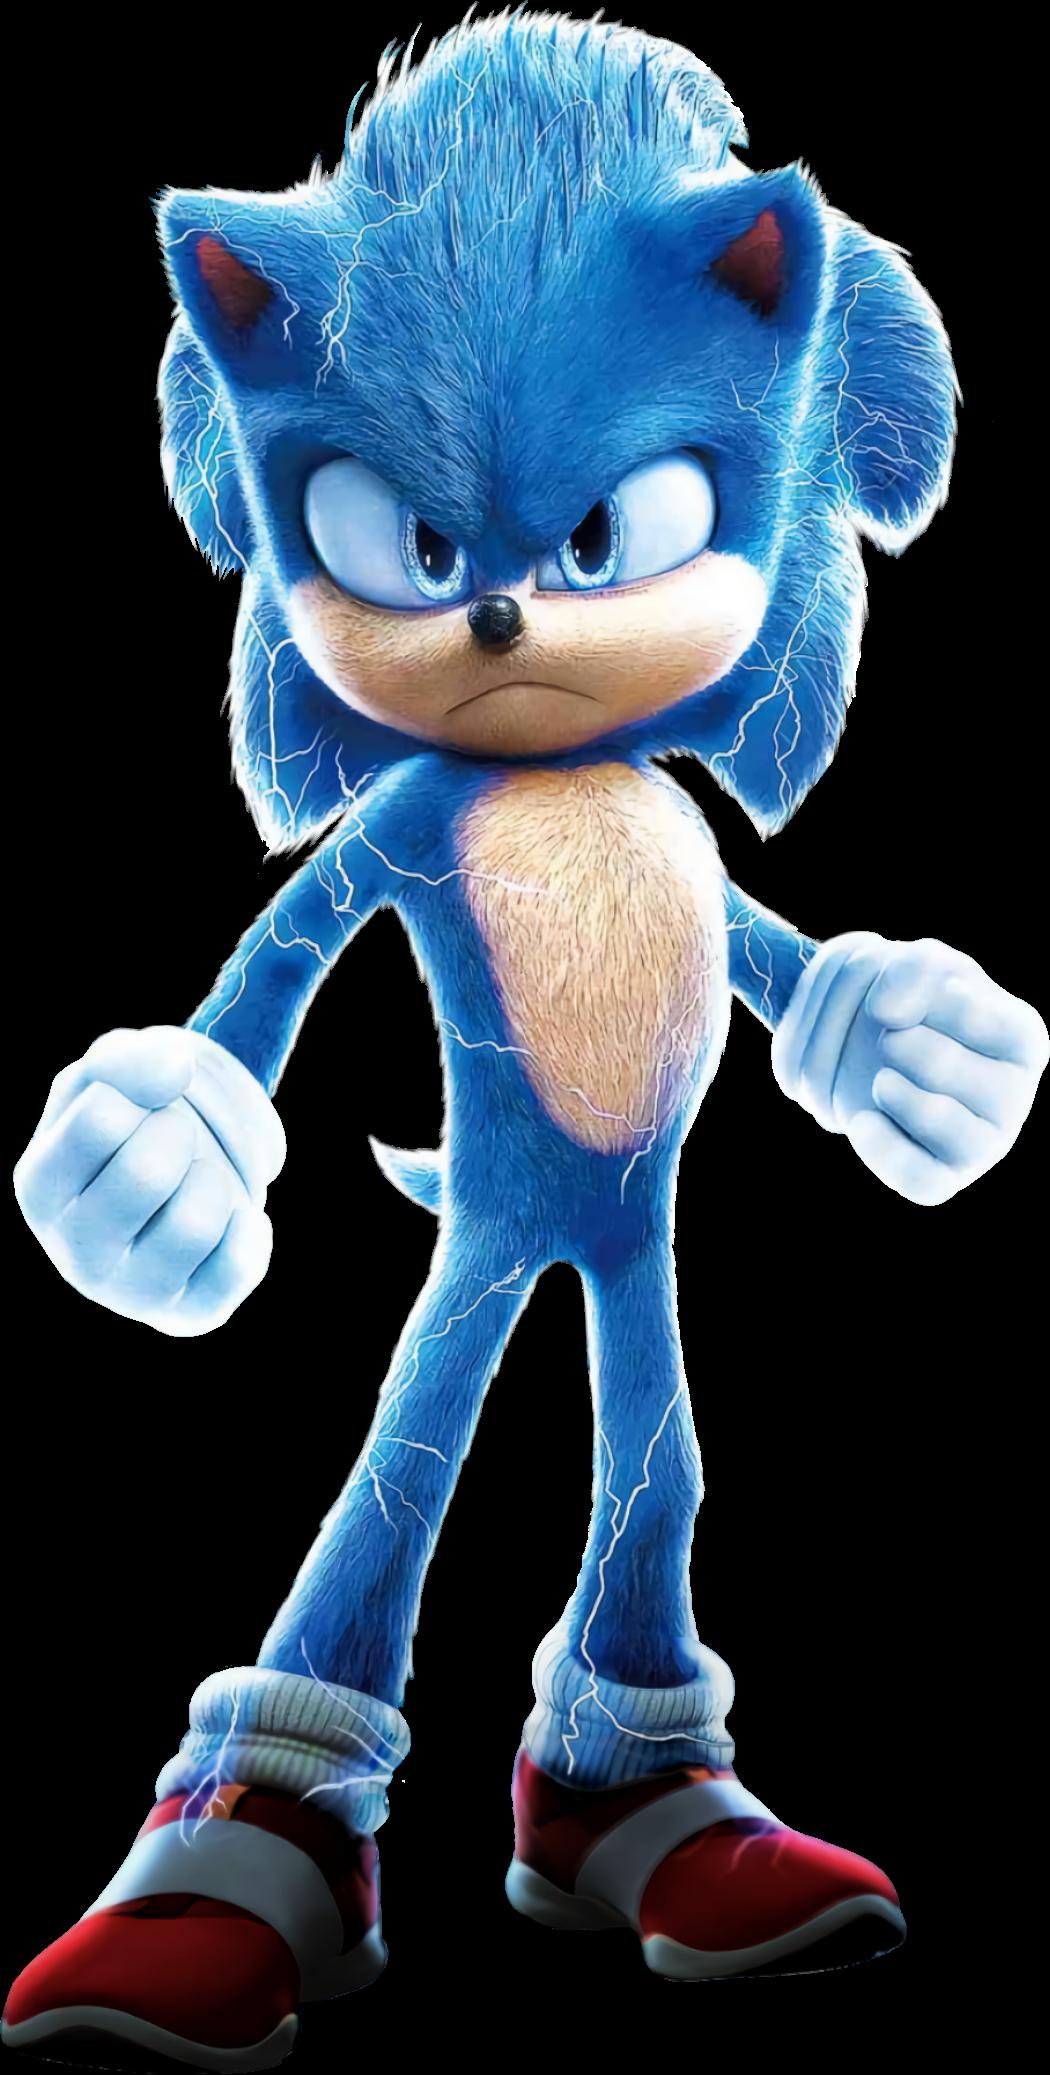 Sonic The Hedgehog 2020 Heroes Wiki Fandom In 2020 Sonic The Hedgehog Sonic Sonic Art